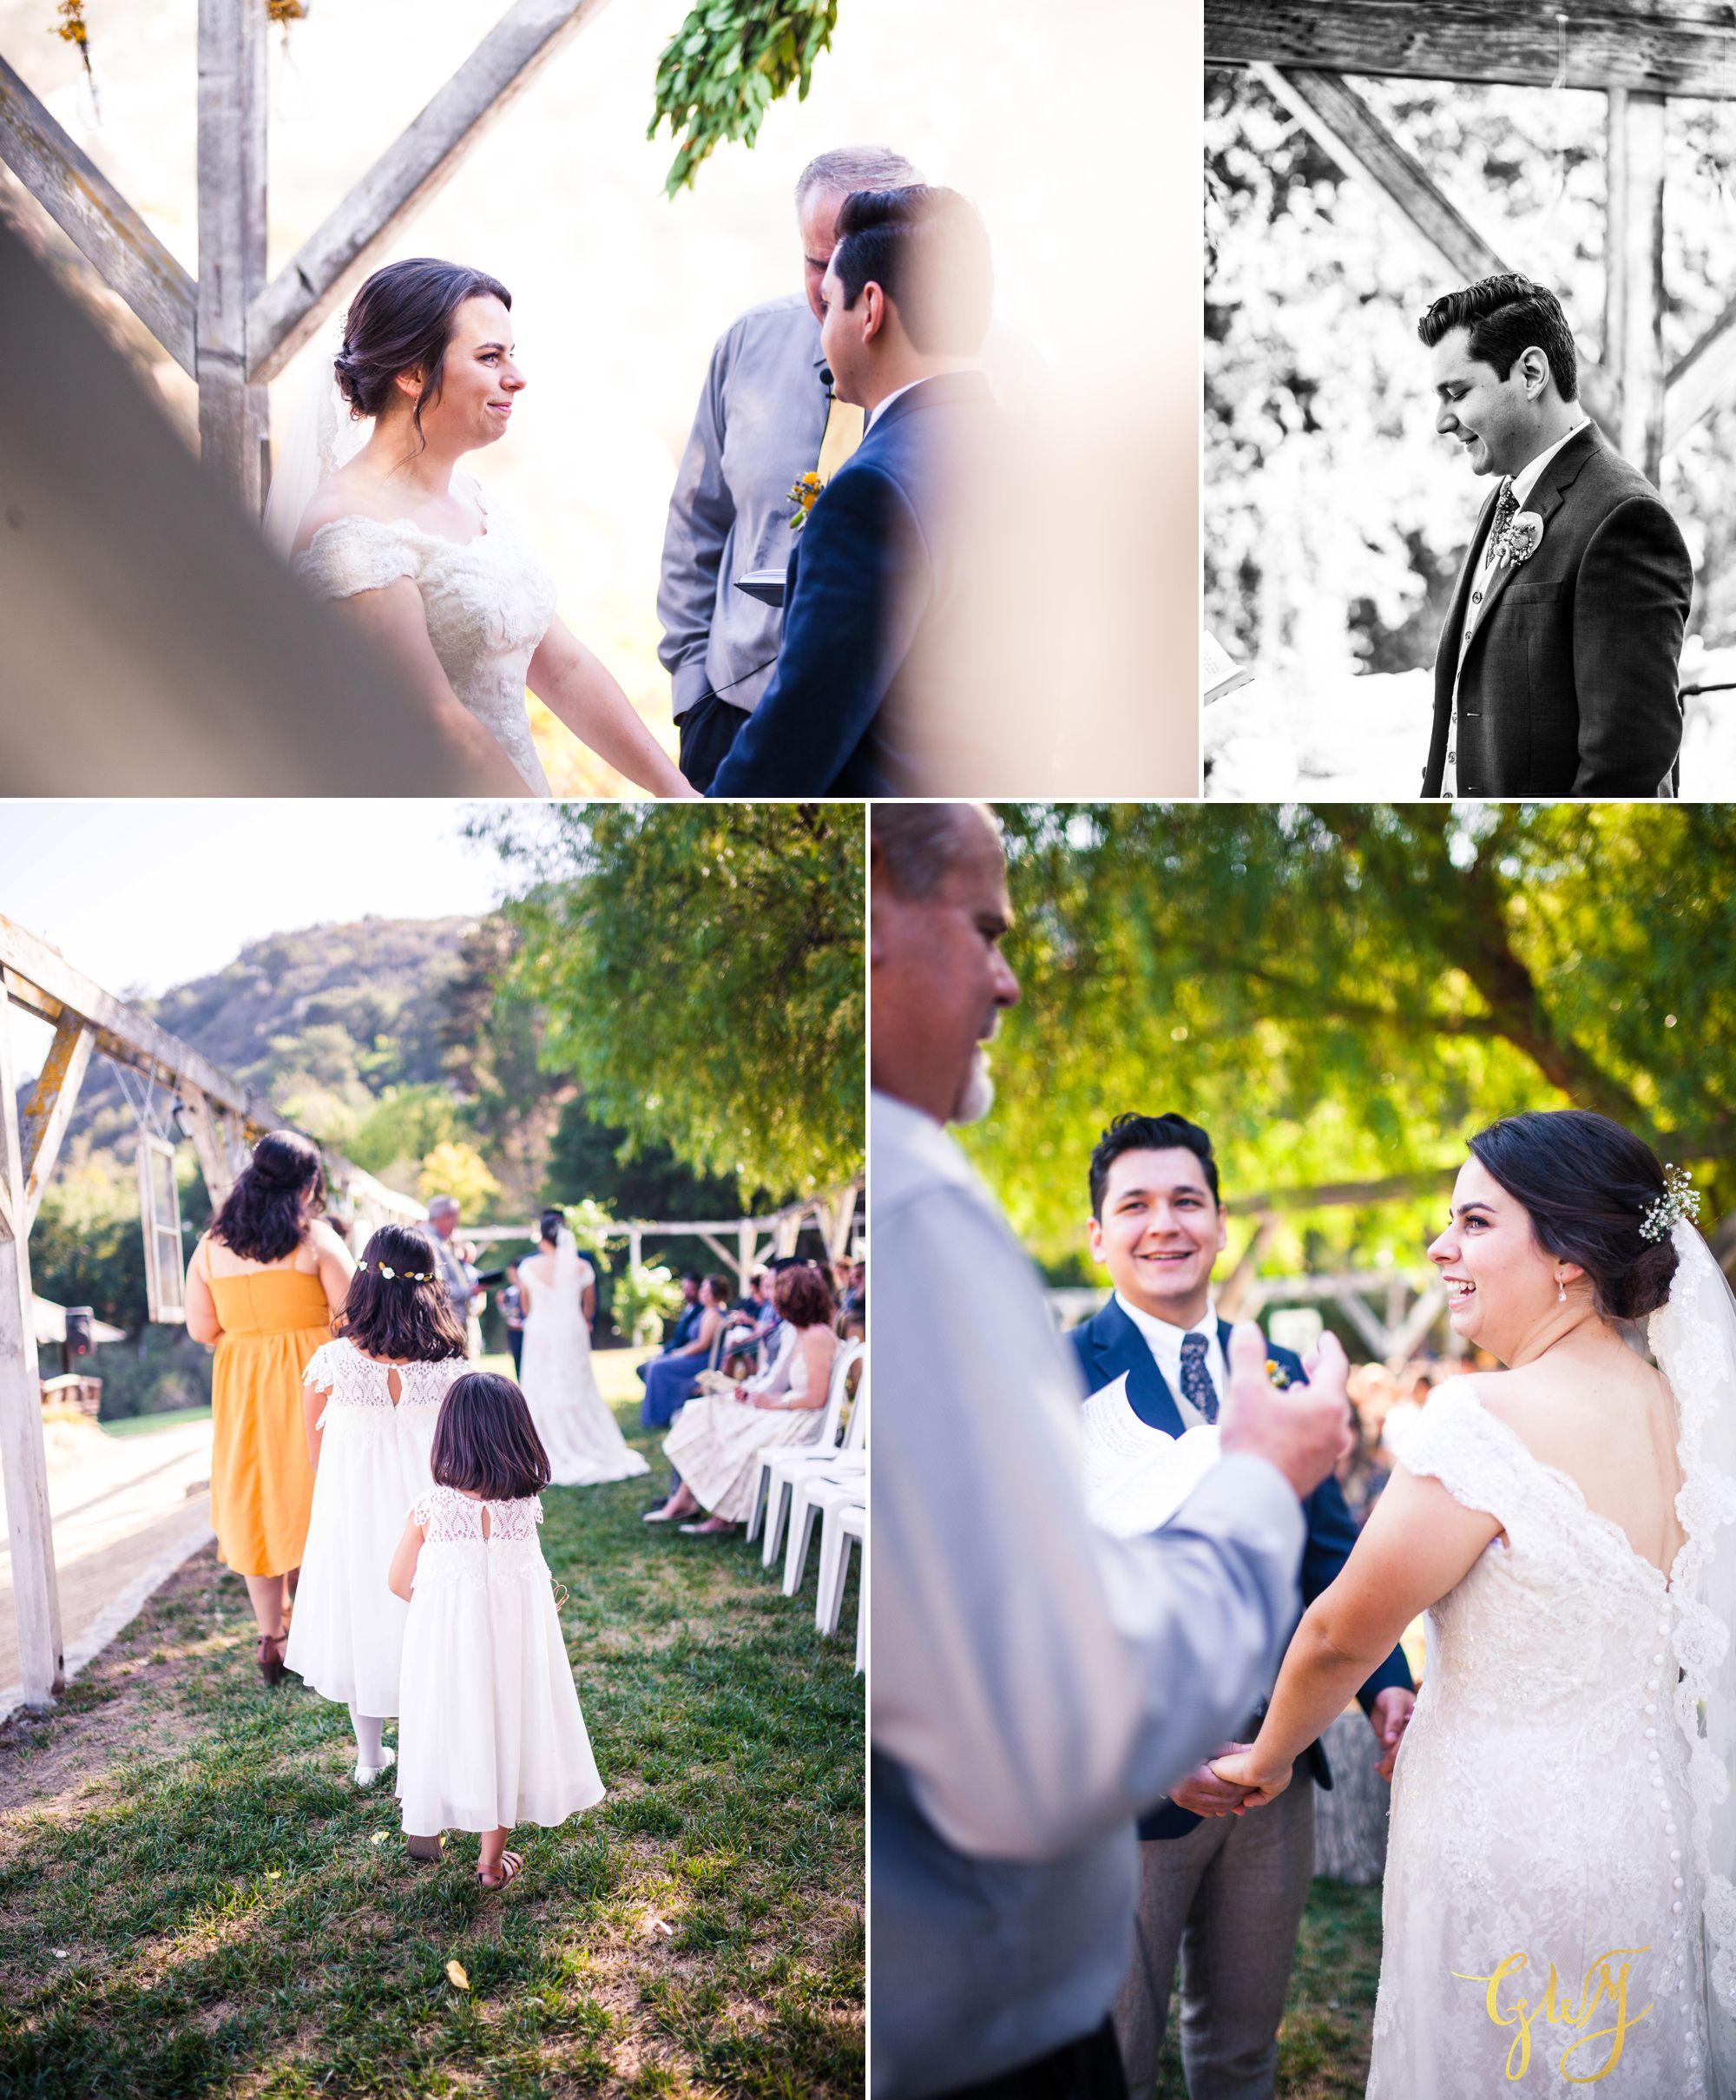 Hannah + Lorenzo Secluded Garden Estate Temecula DIY Wedding by Glass Woods Media 15.jpg